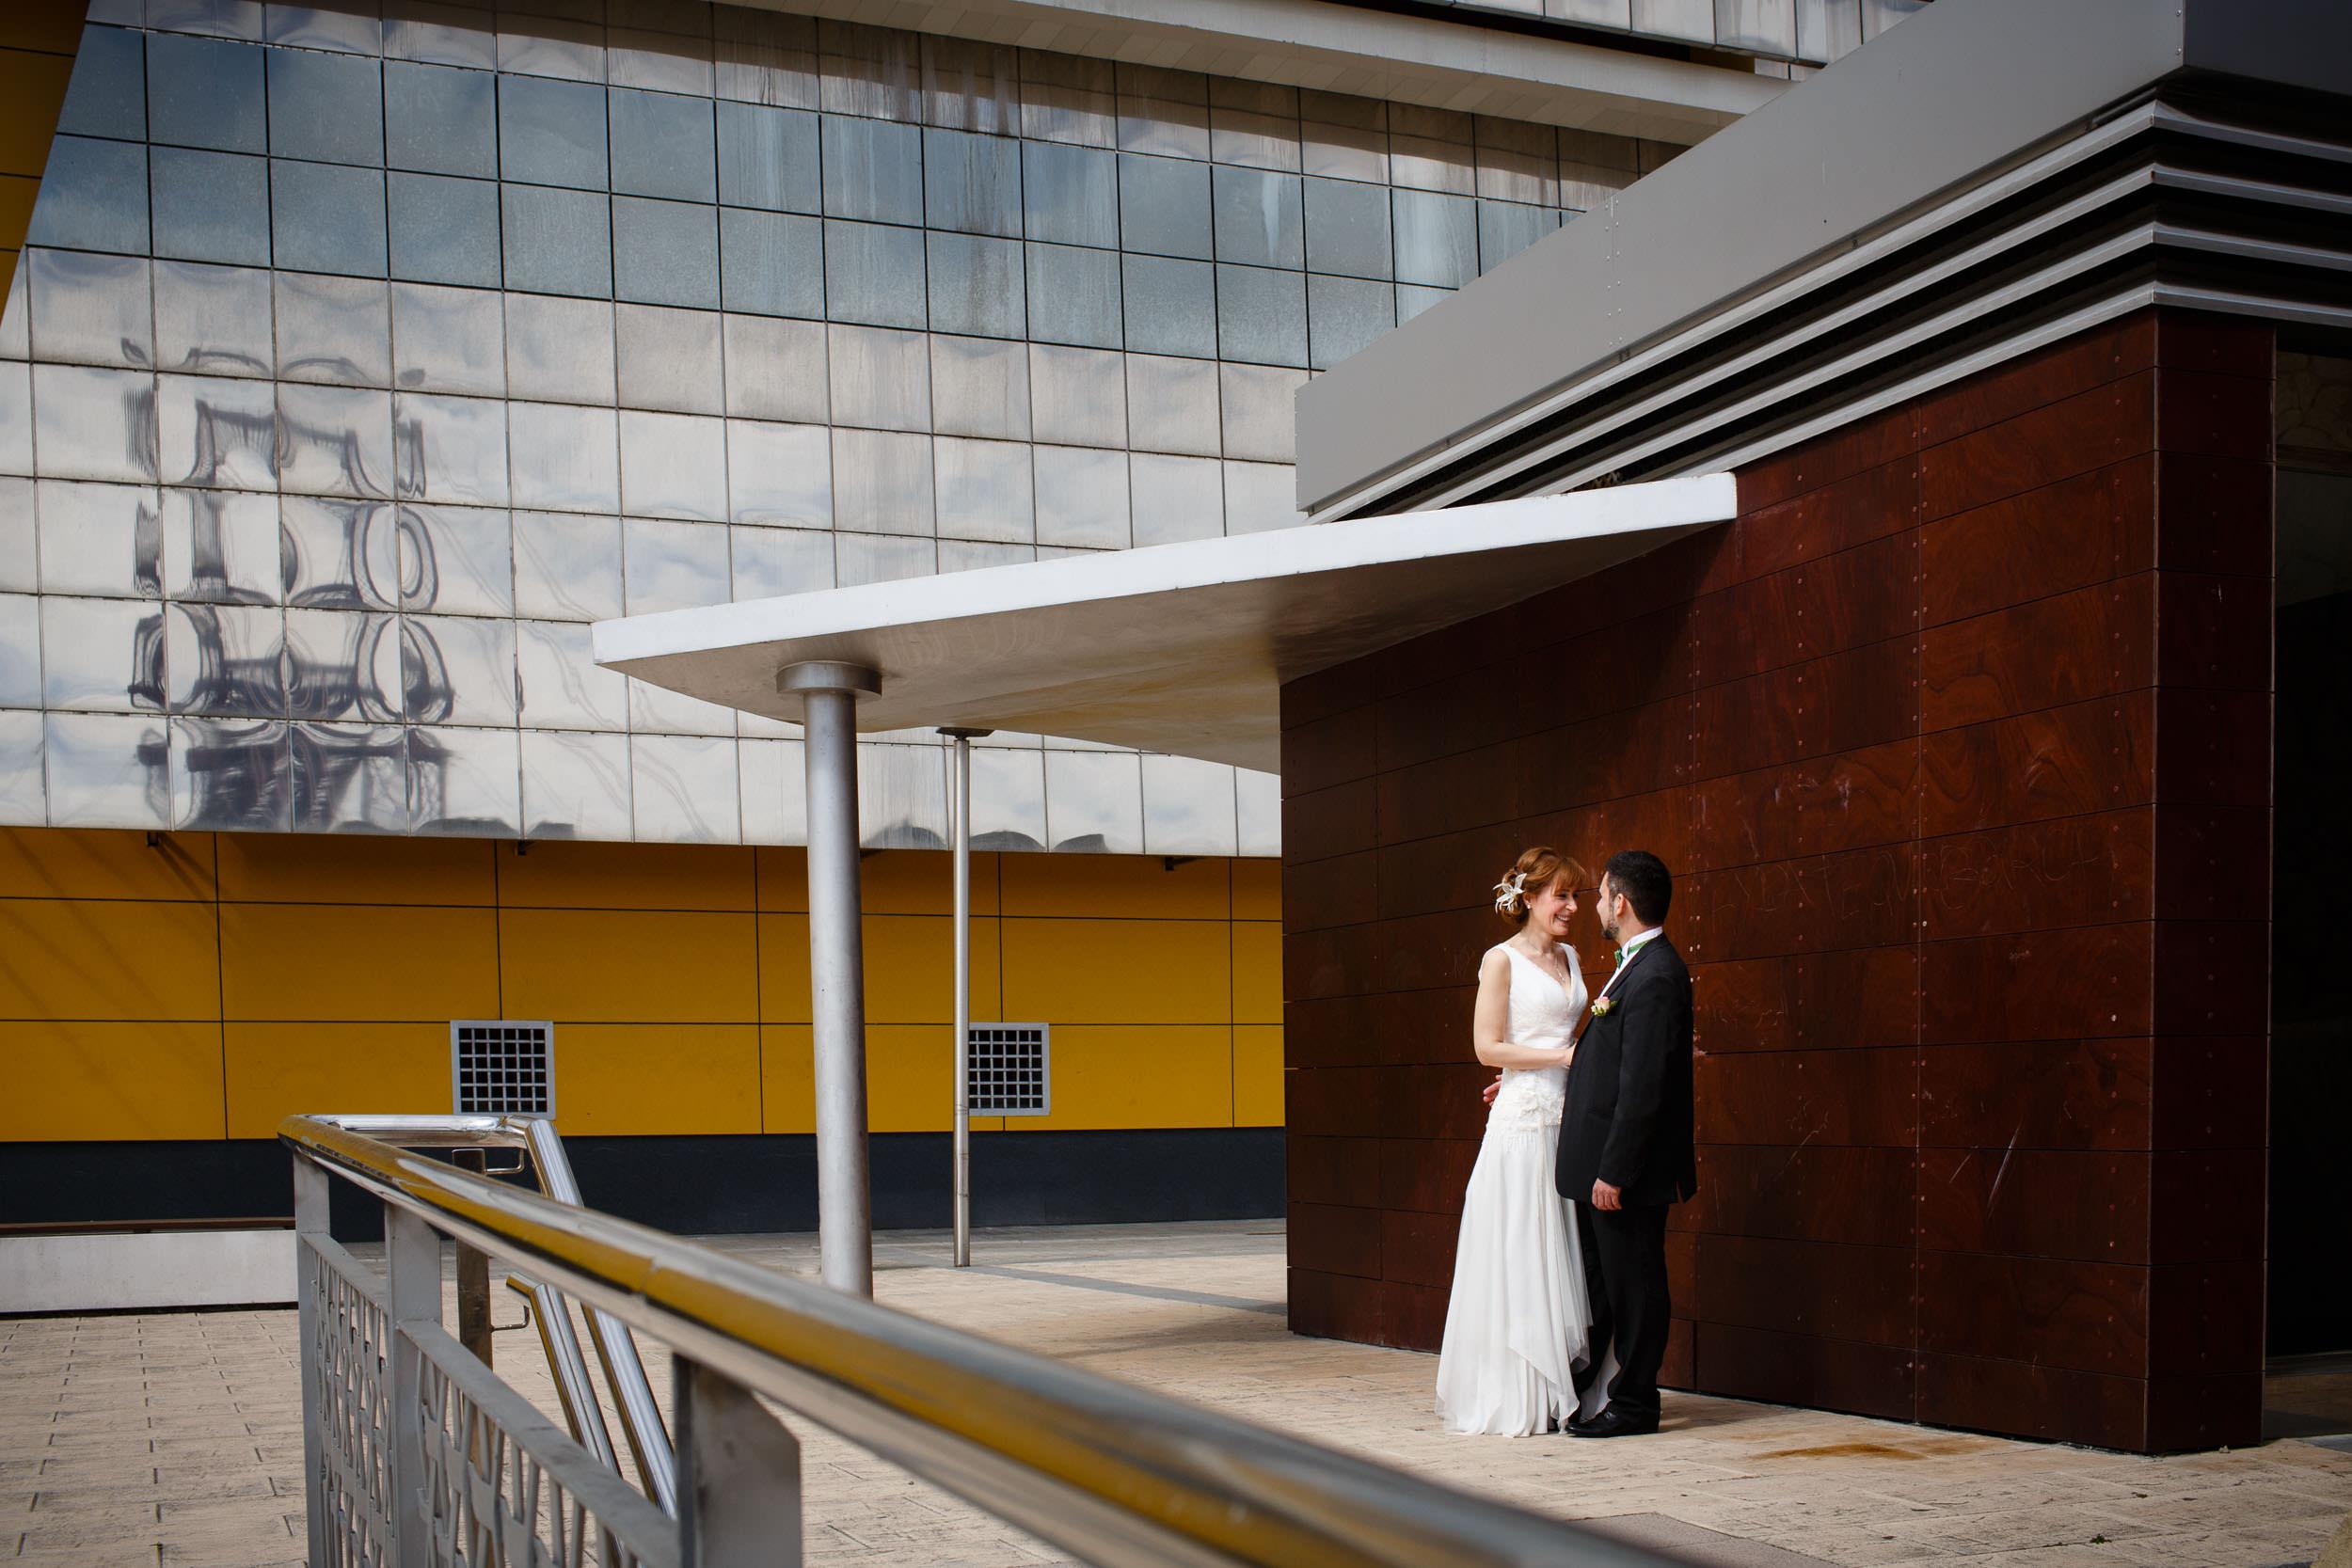 Engagement photography in Portugalete, Basque Country, Spain - James Sturcke  Photographer | sturcke.org_004.jpg